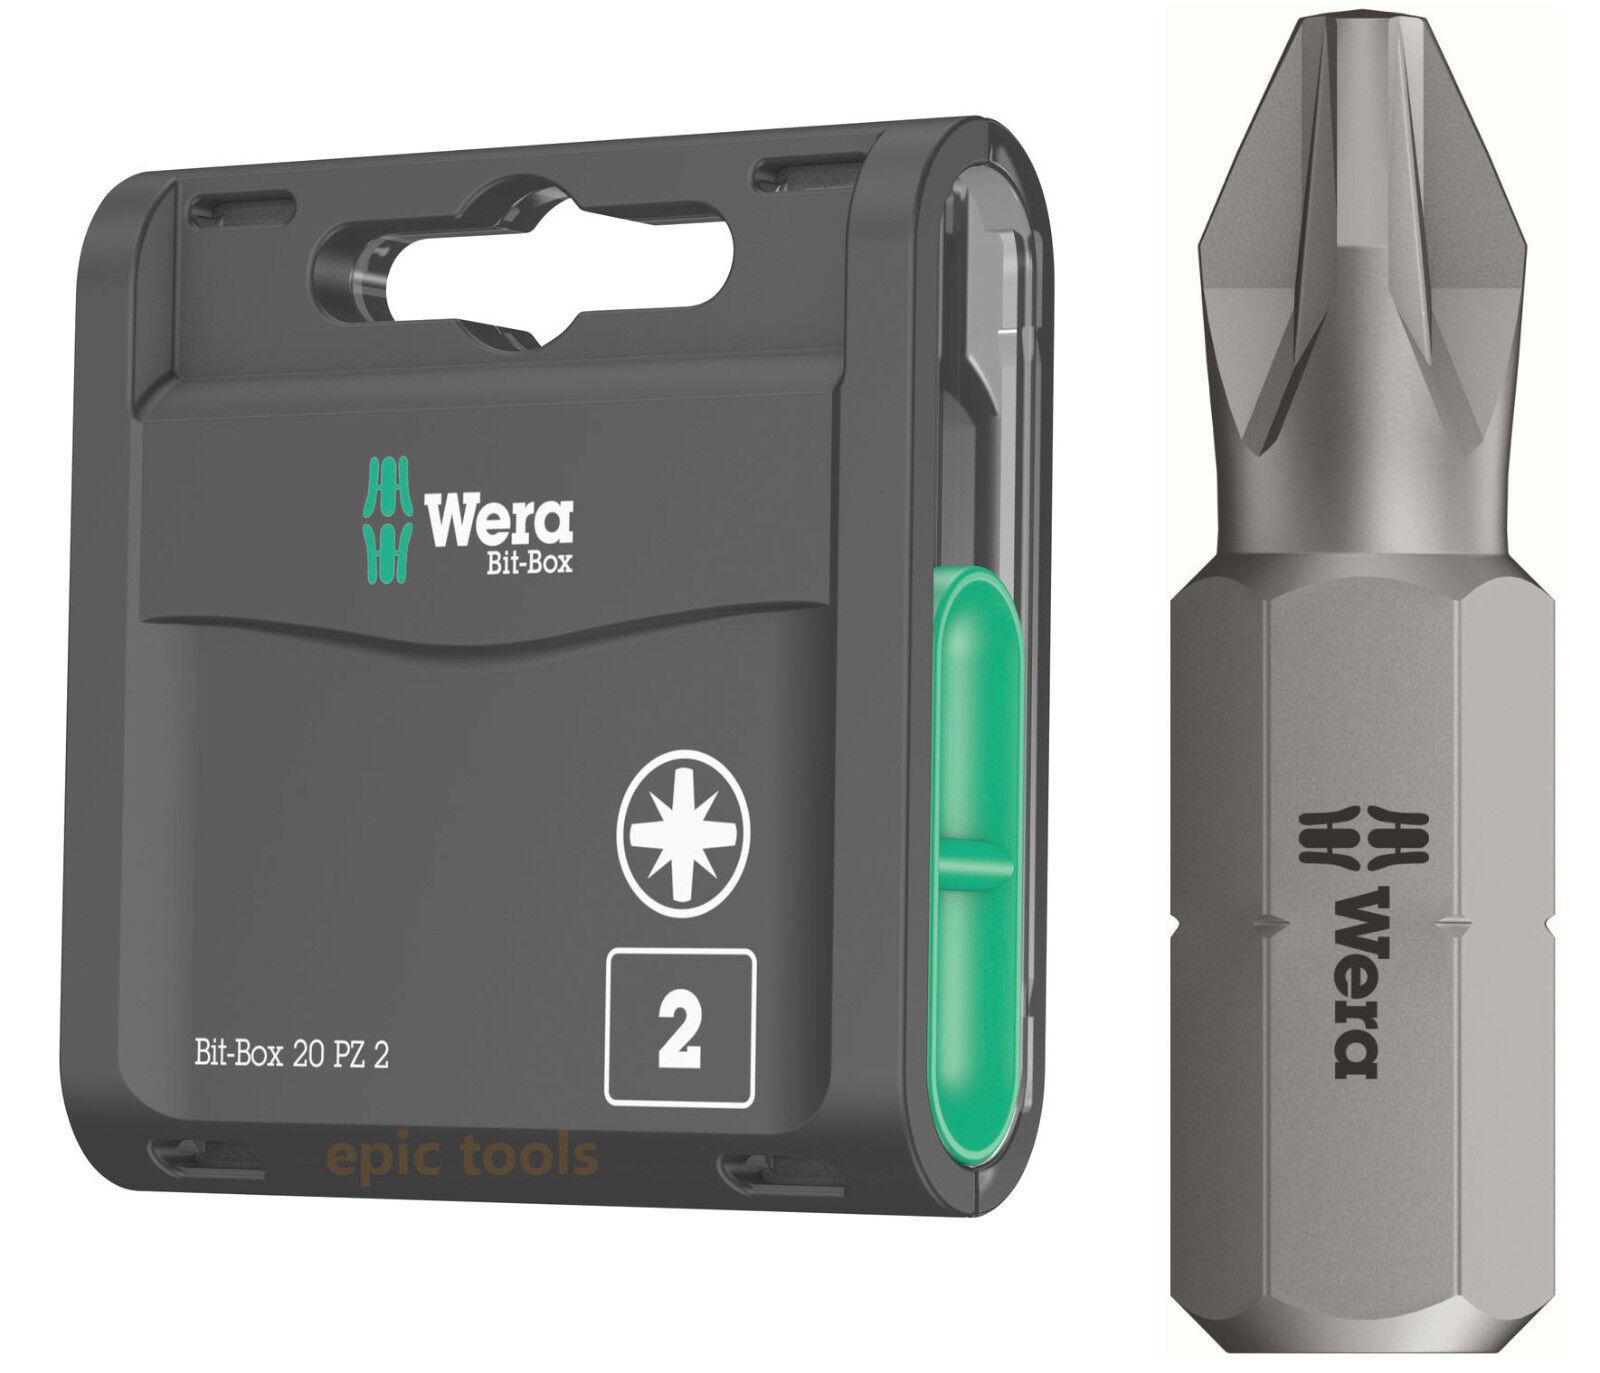 Wera 05057760001 Bit-Box 20 PZ 2 Pack of 20